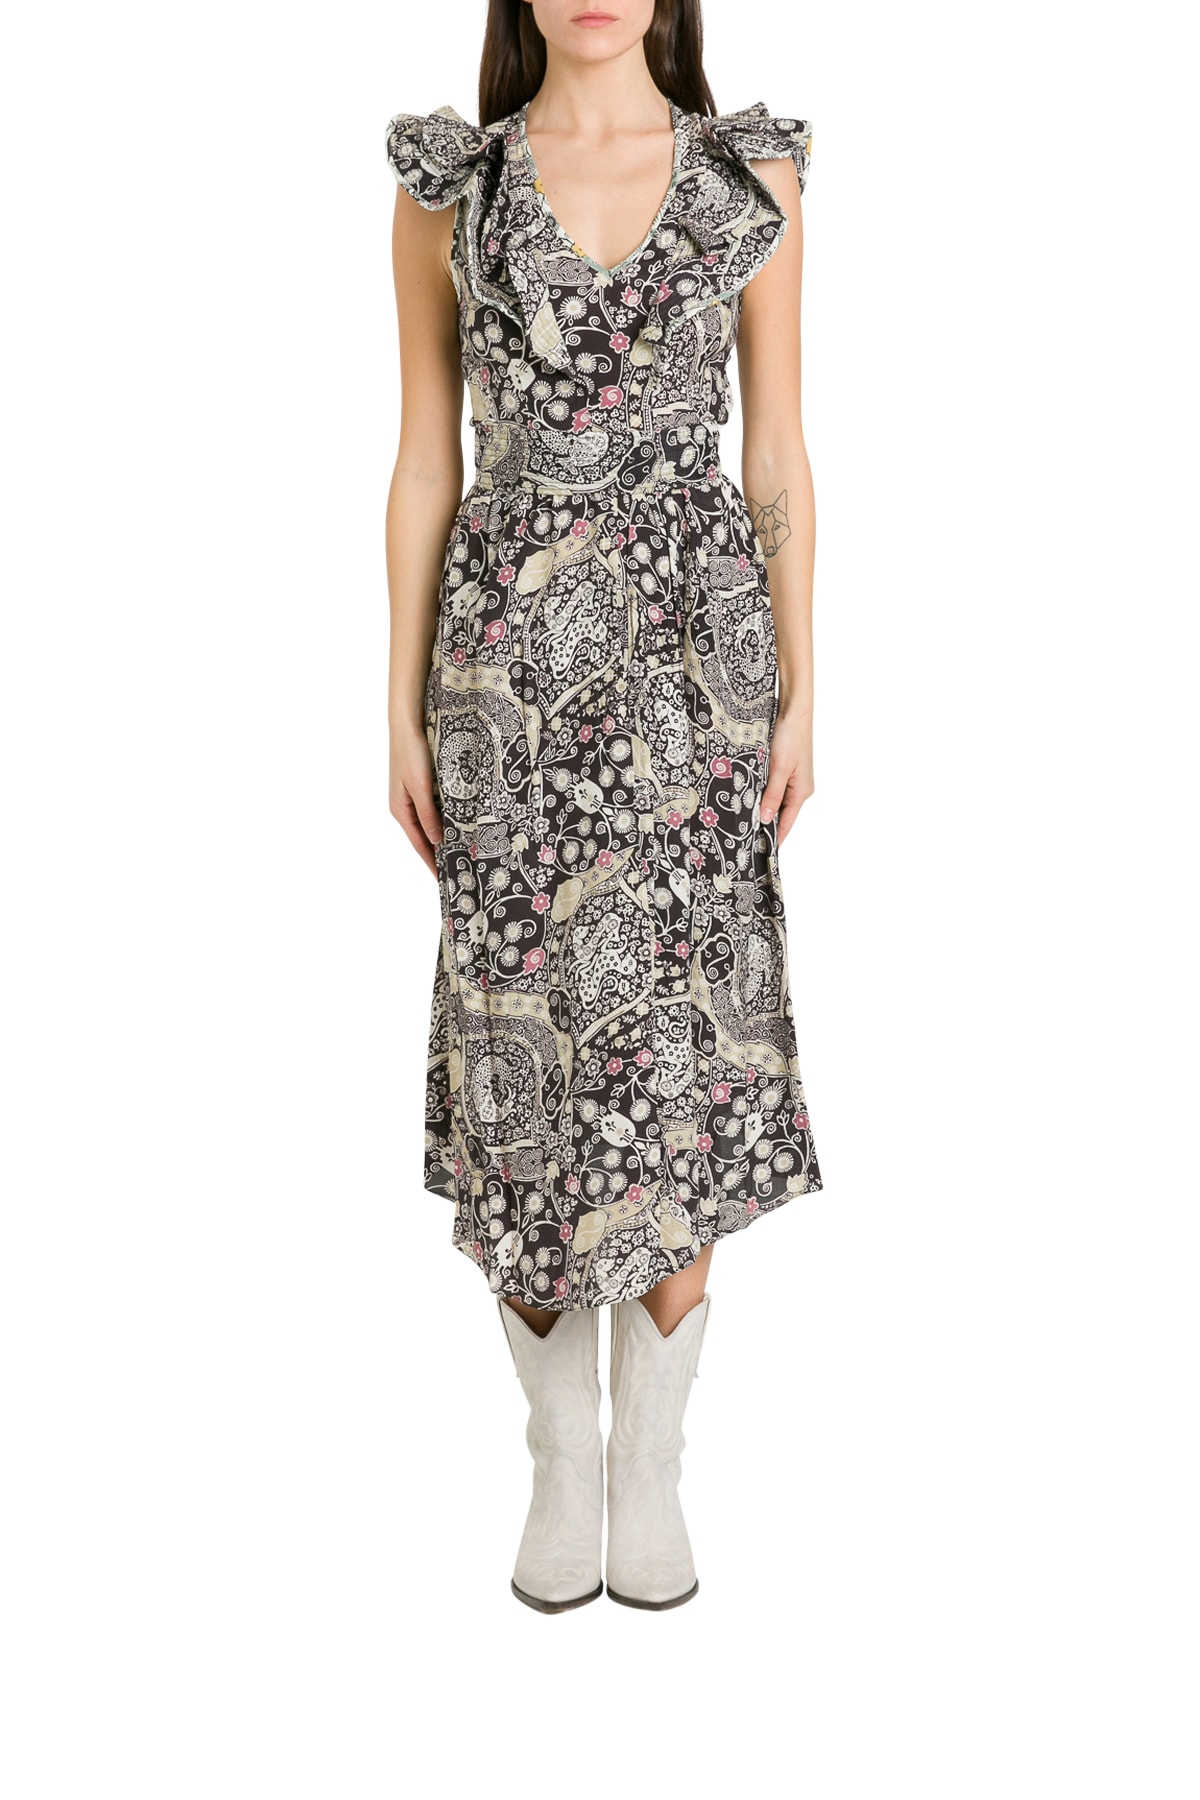 Buy Isabel Marant Étoile Coraline Asymmetric Dress online, shop Isabel Marant Étoile with free shipping